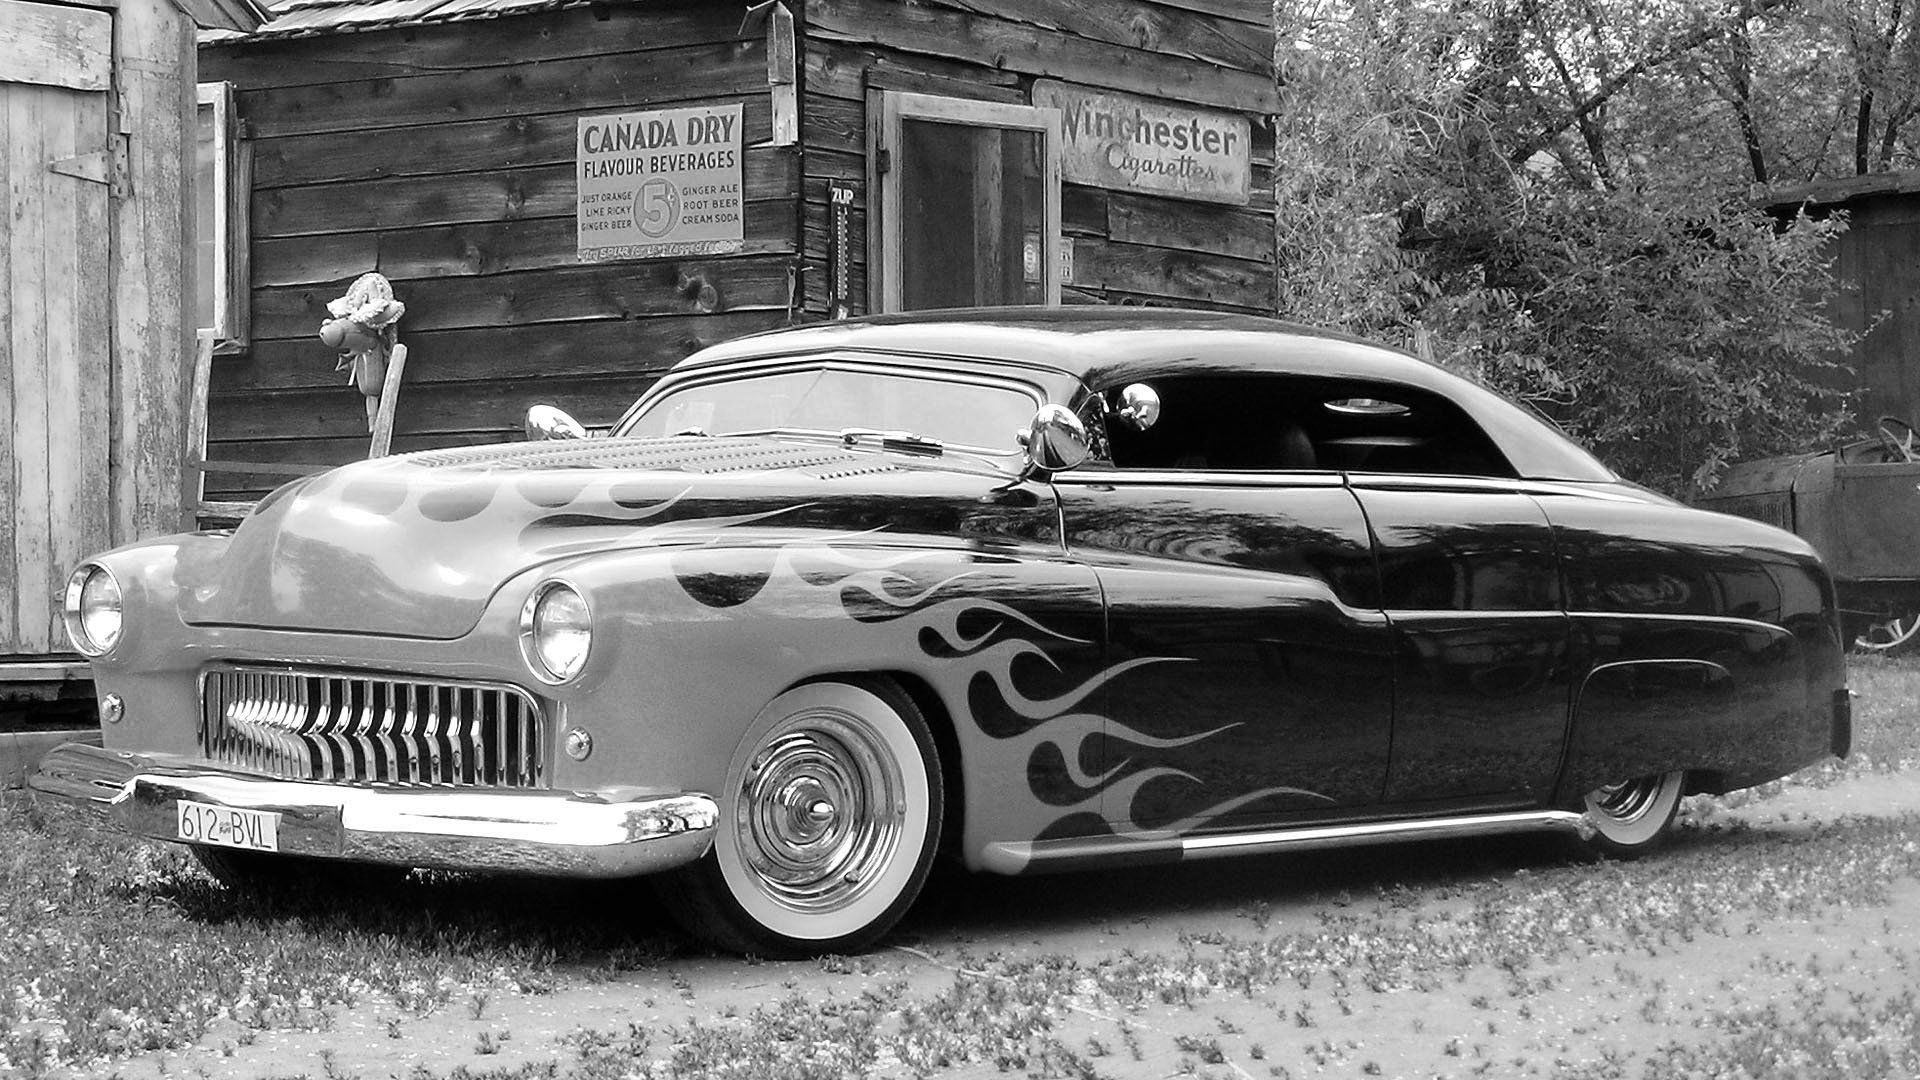 Old School Flames Hot Rod | Classic Car Full HD Wallpaper and ...